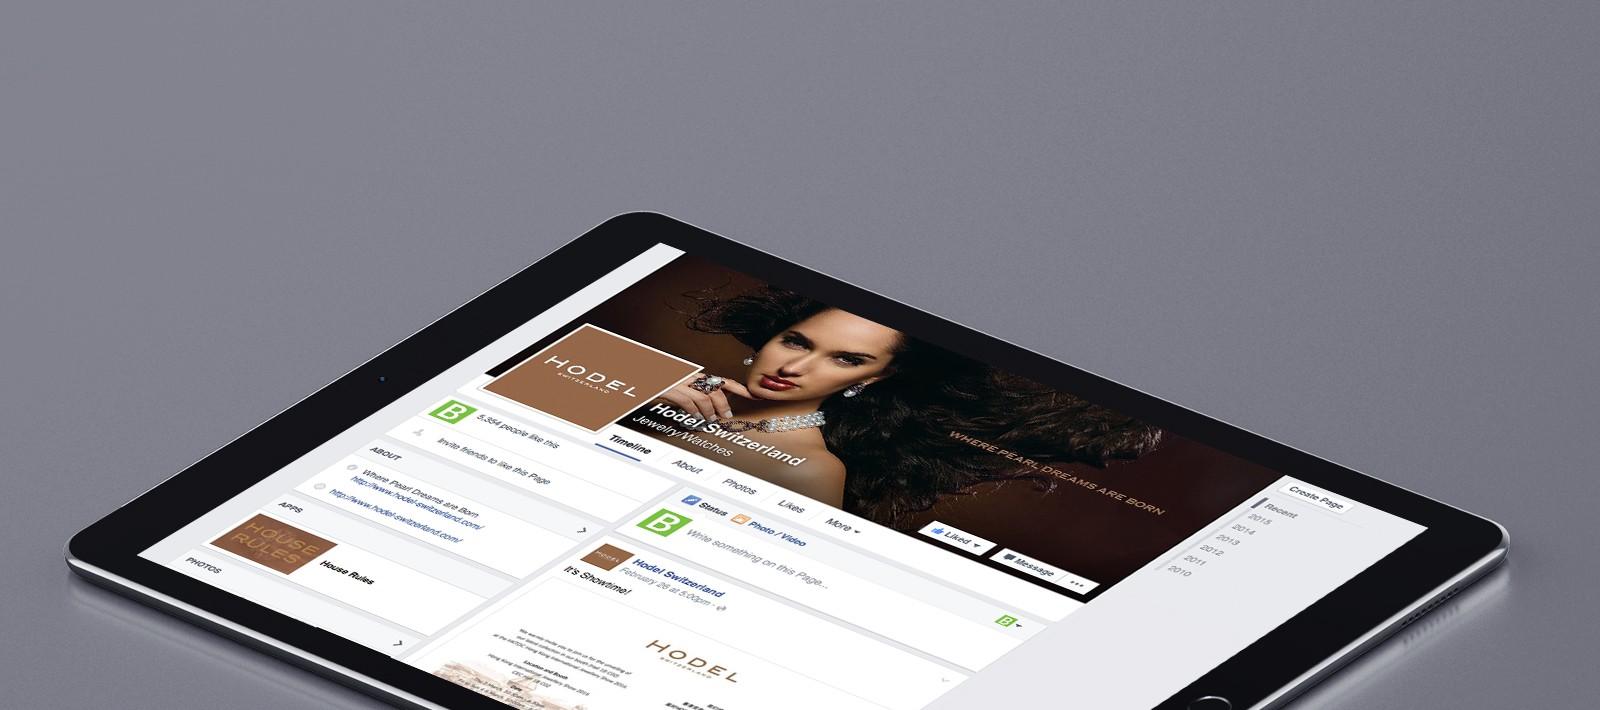 Luxury fashion social media marketing strategy